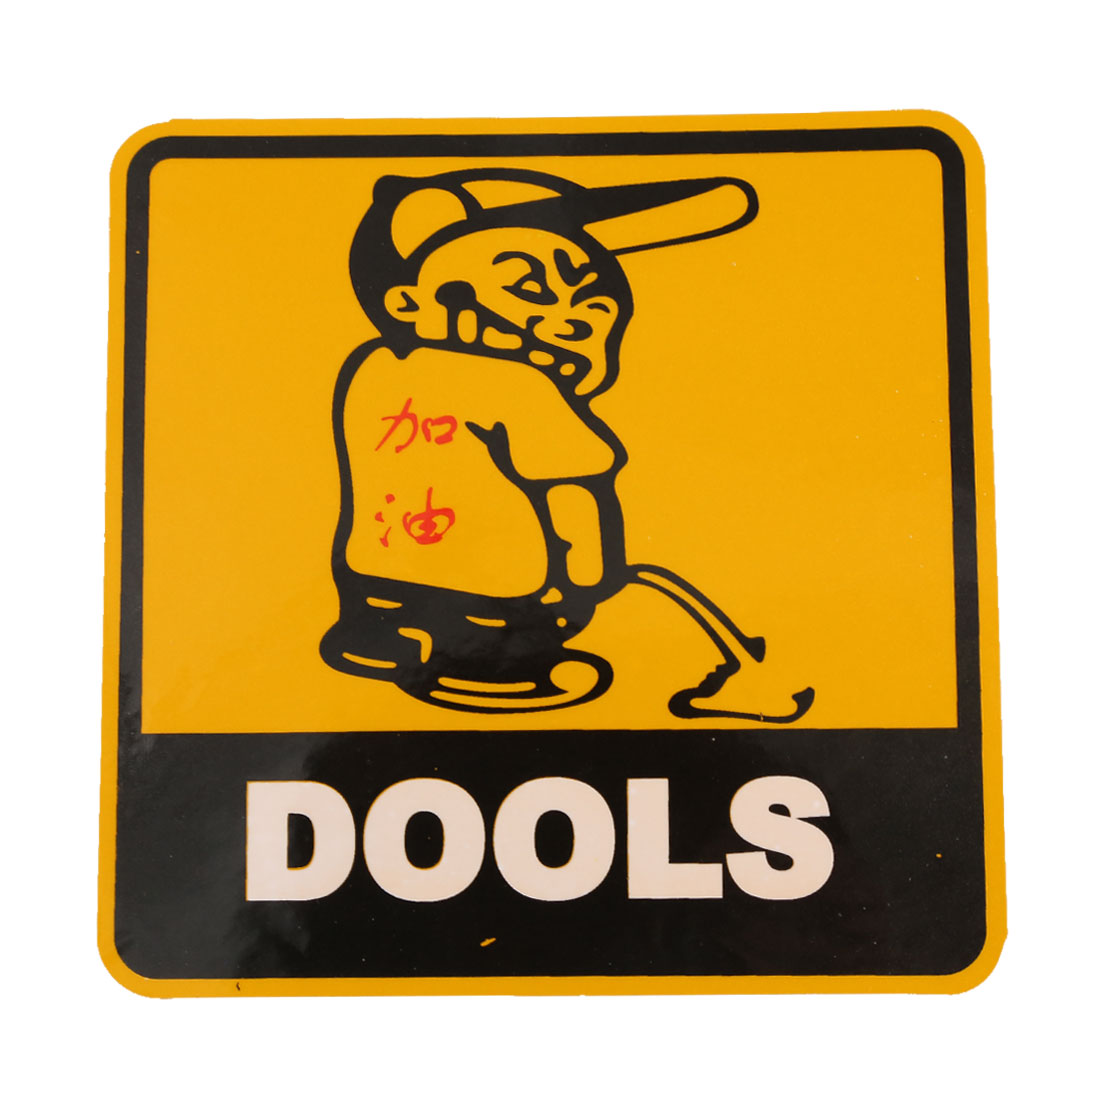 Kid Pattern Dools Print Stick-on Reflective Sticker Decor Yellow Black for Car